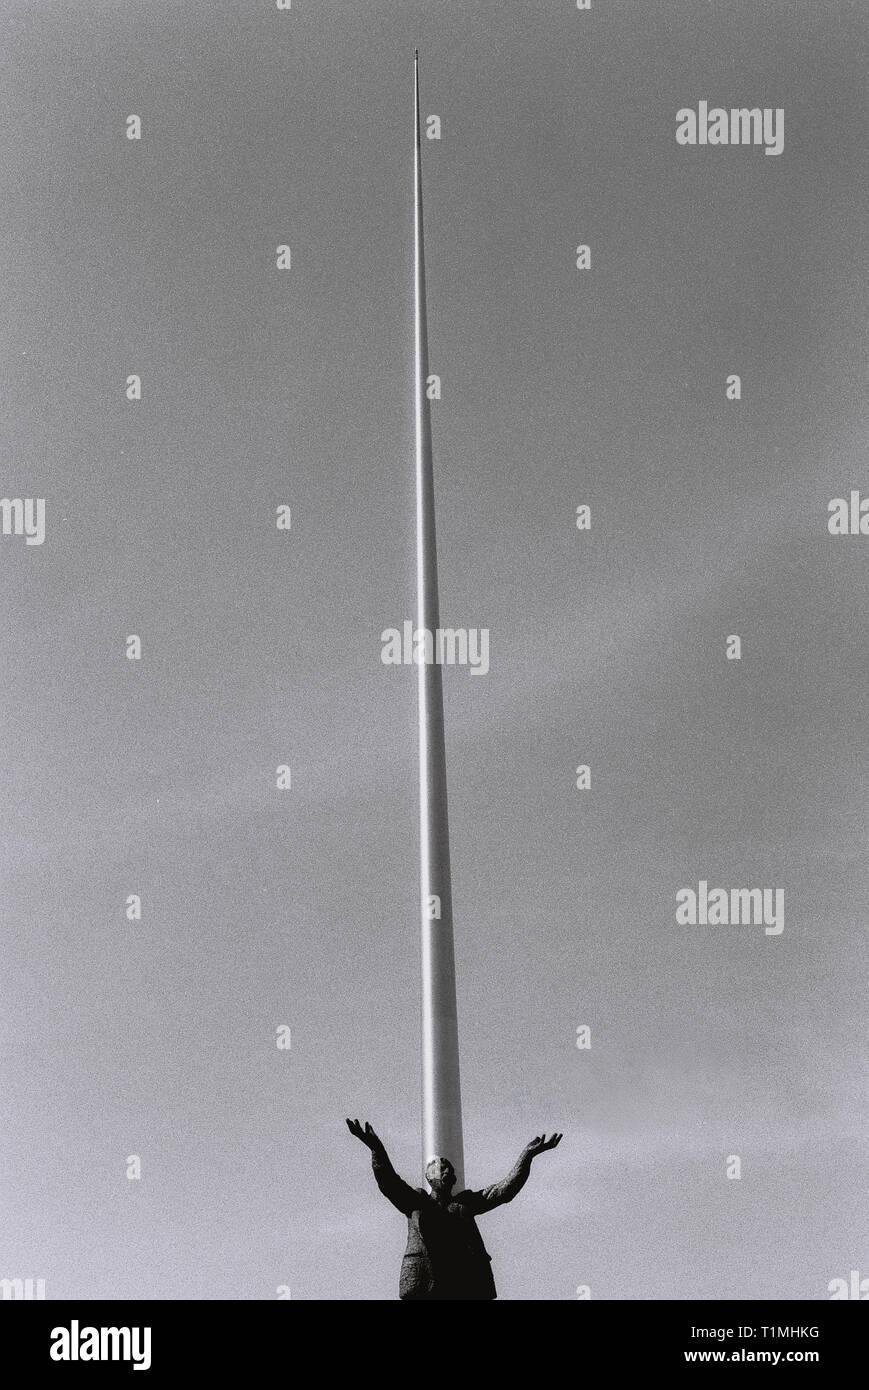 Jim Larkin Statue and Spire of Dublin - Dublin, Ireland - High Quality Scanned Negative - 35mm - Stock Image